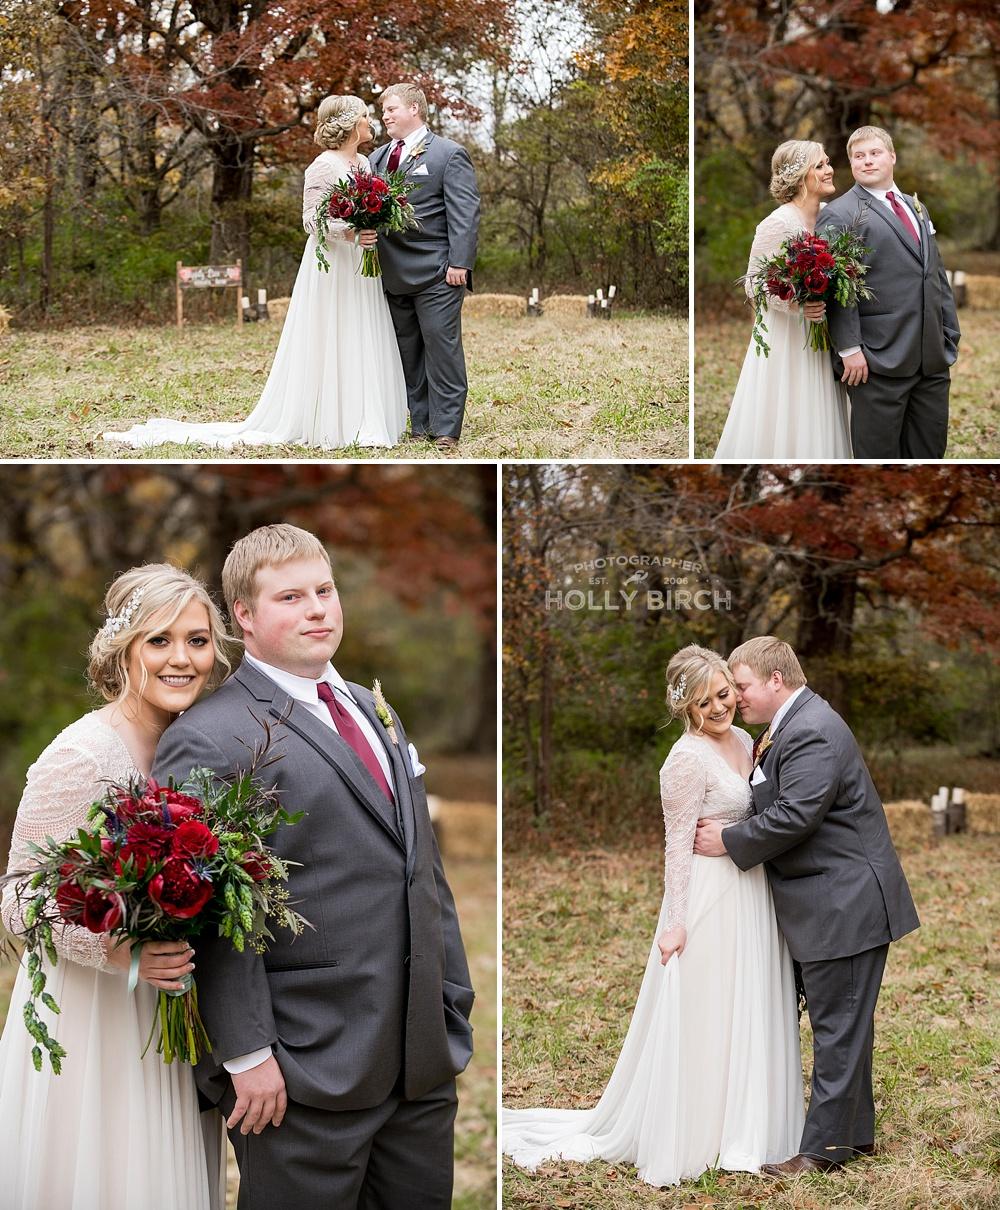 Taylorville-PIllars-Event-Center-fall-farm-wedding-with-corn_4150.jpg